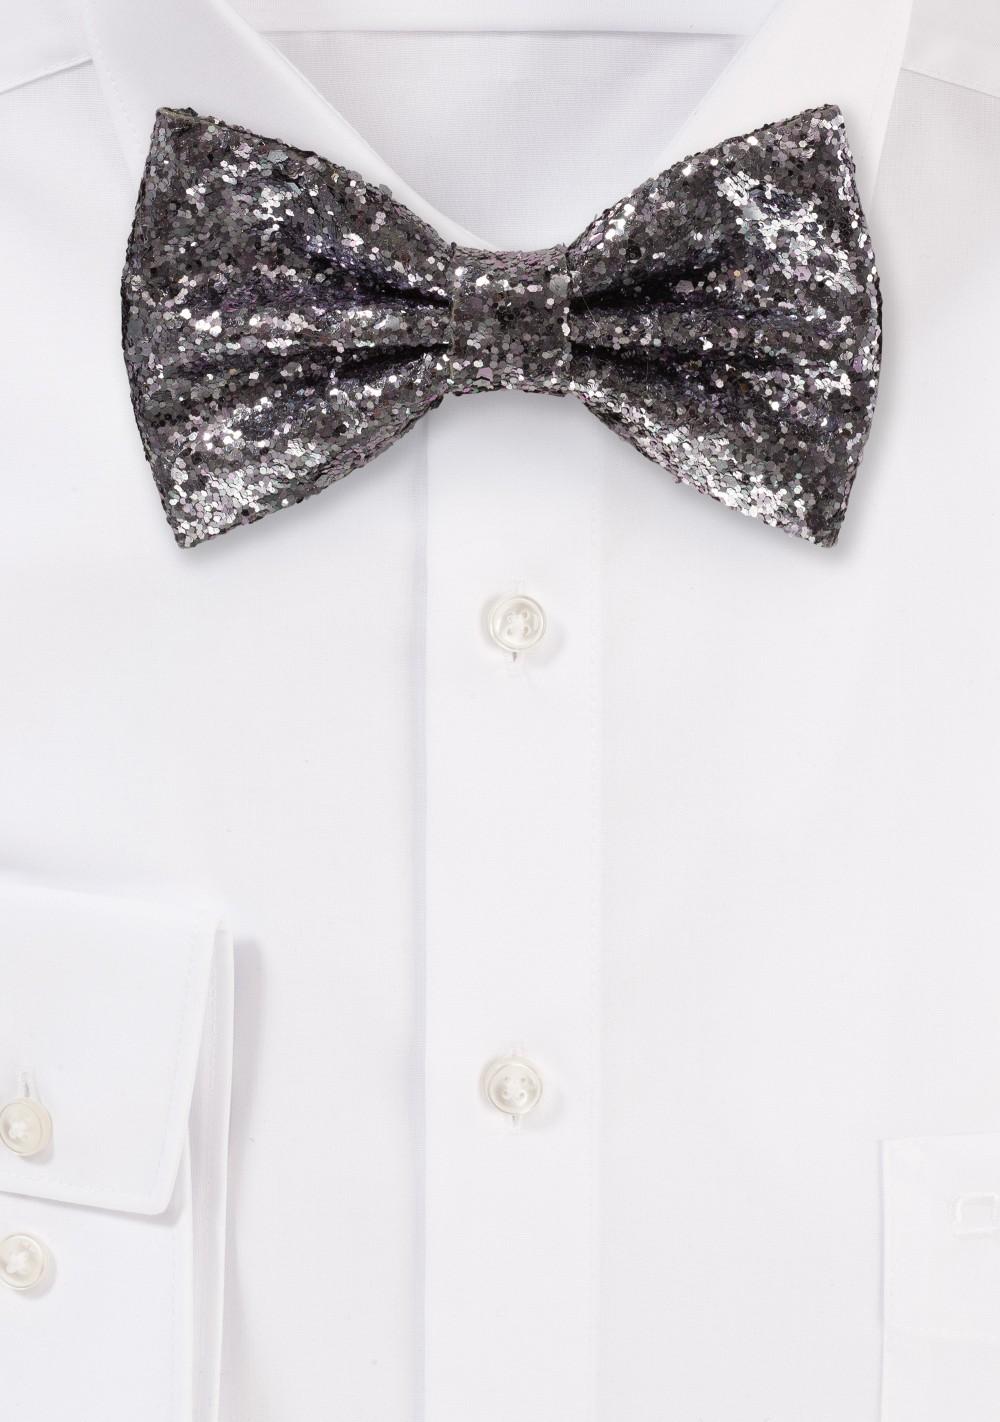 Lilac Glitter Bow Tie silver gray metallic bowties